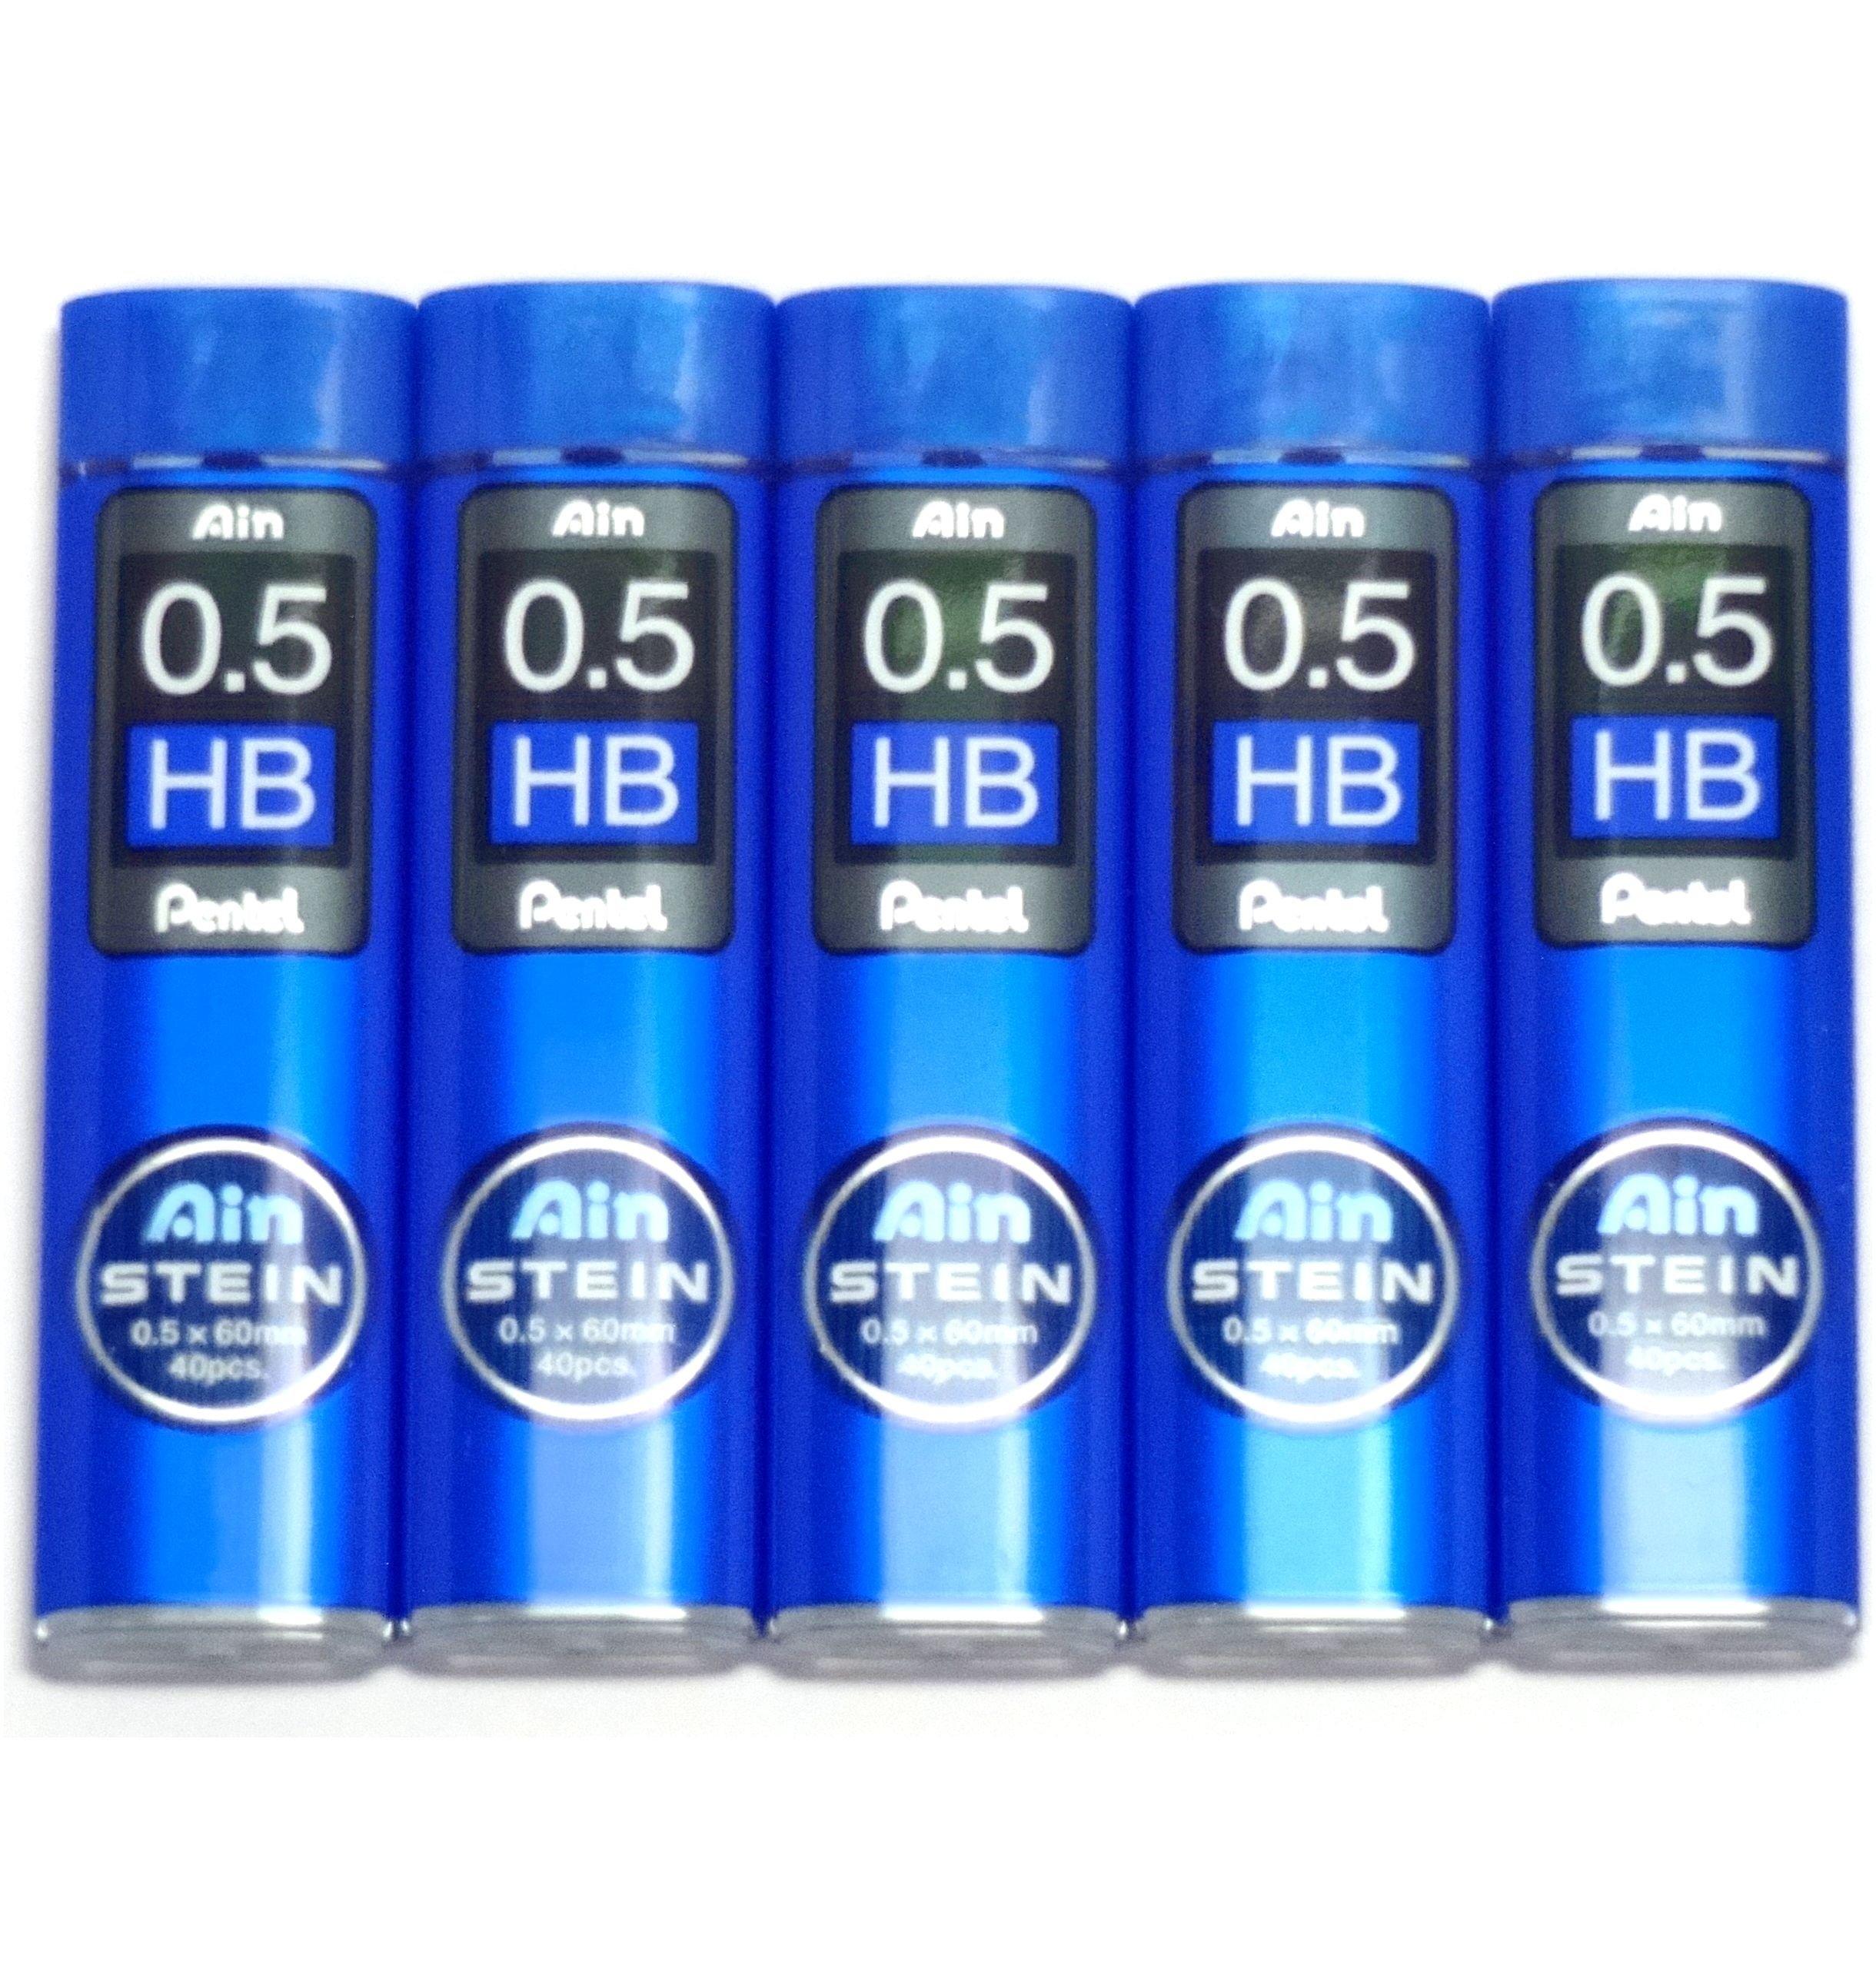 Pentel Ain Stein 200 Minas (5 Tubos) 0.5mm HB